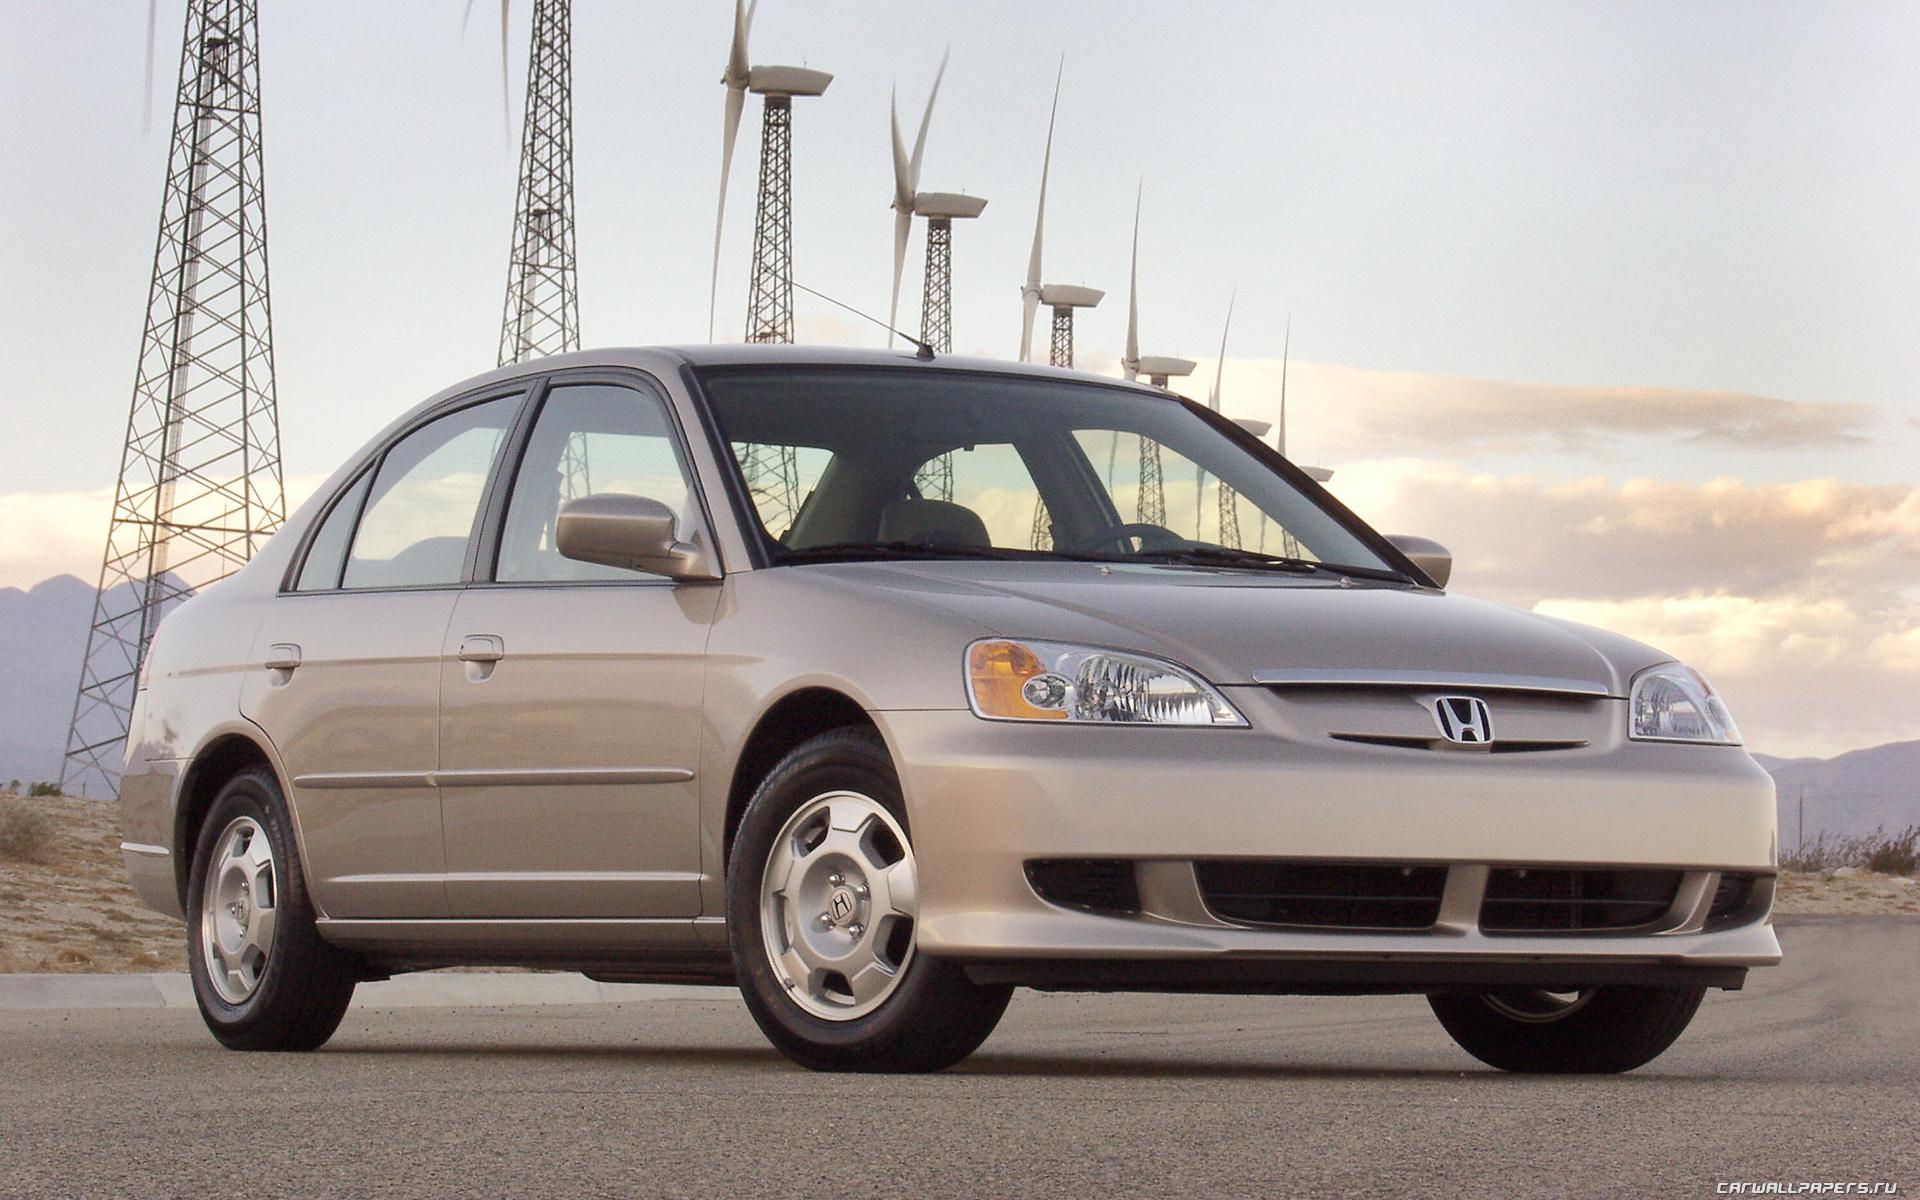 Cars Desktop Wallpapers Honda Civic Hybrid Us Spec 2003 1280x800 1440x900 1680x1050 1920x1200